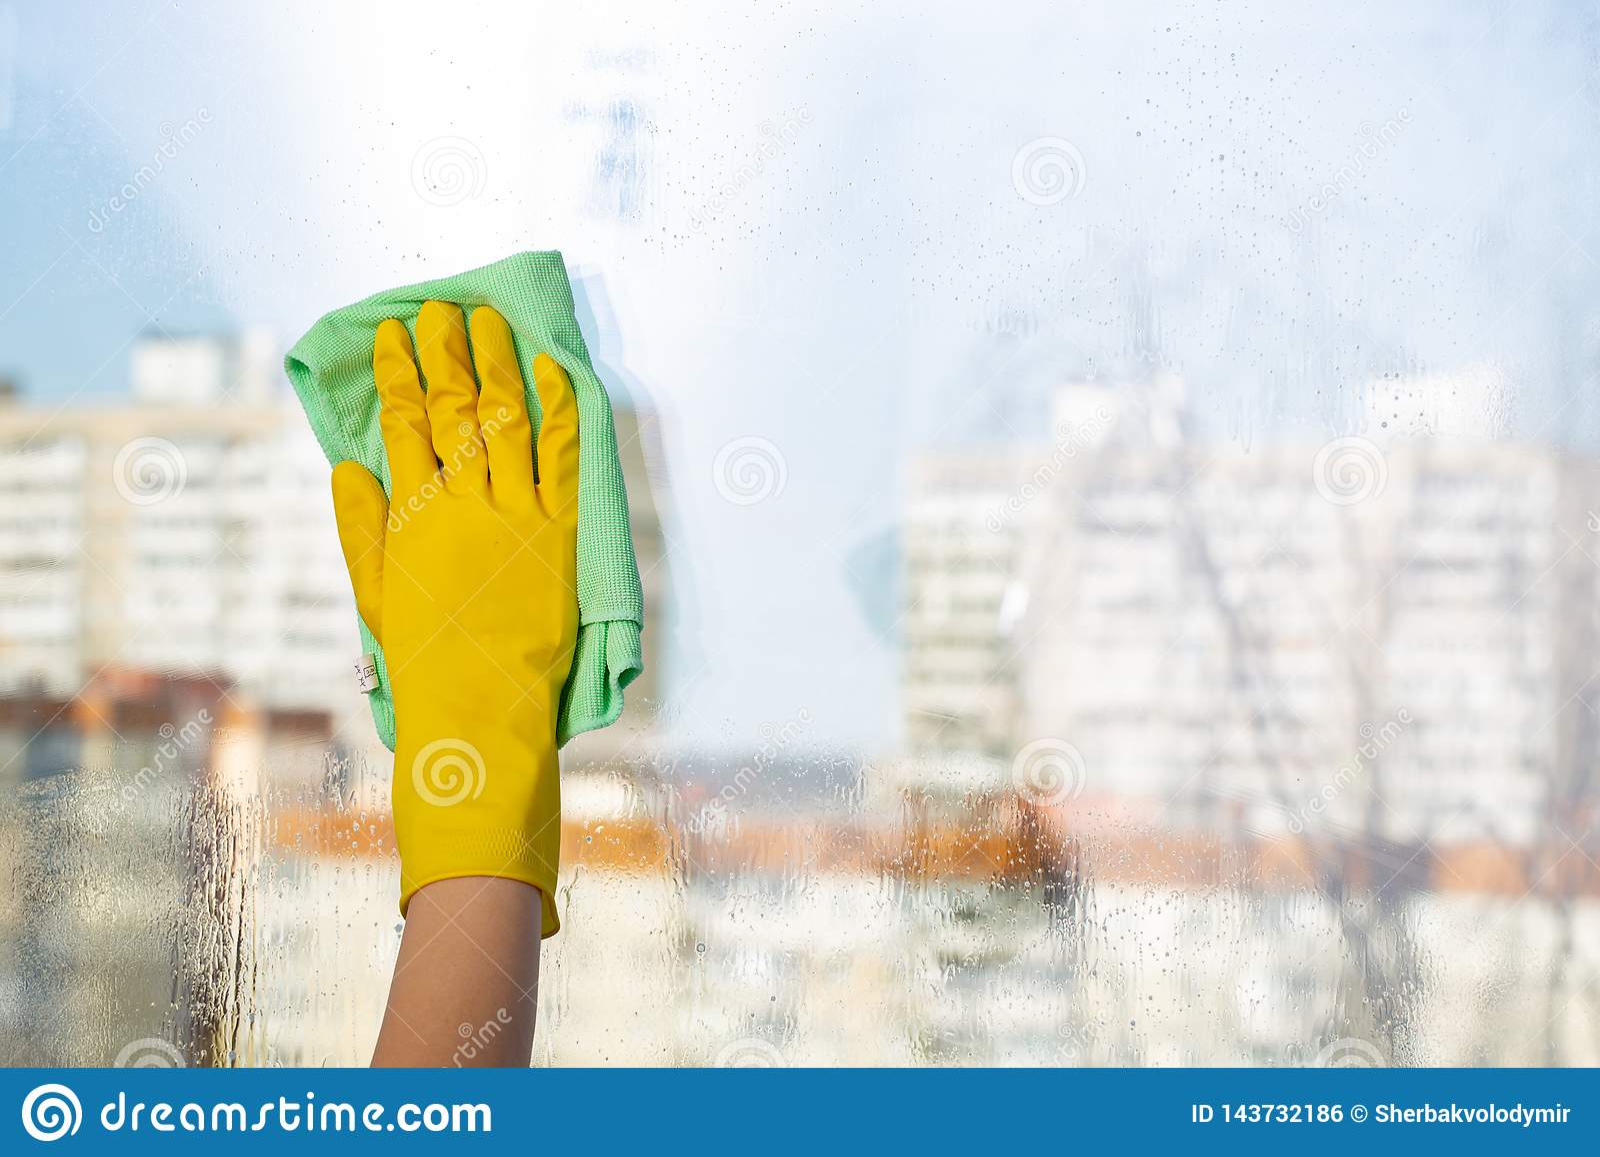 Janelas da limpeza com pano especial Limpeza da primavera